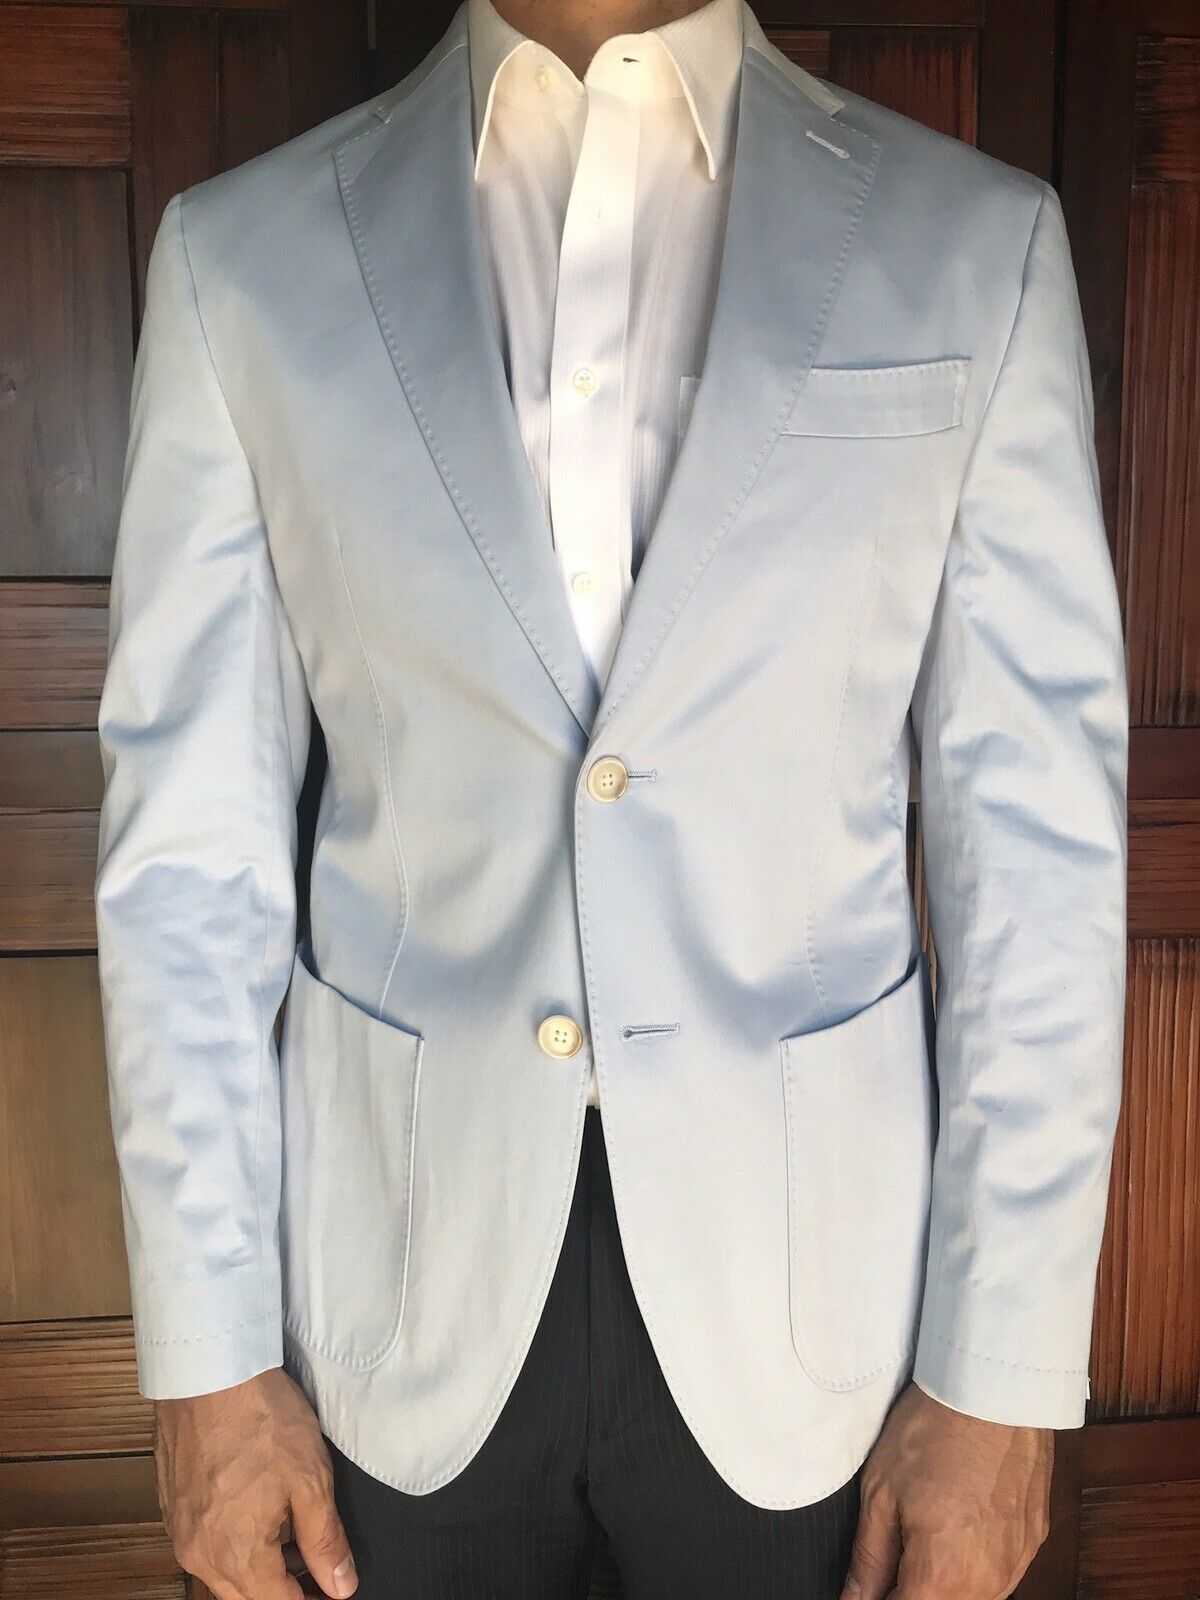 JKT New York Men's Light bluee Cotton Sporstcoat in Slim Fit Size 42R New